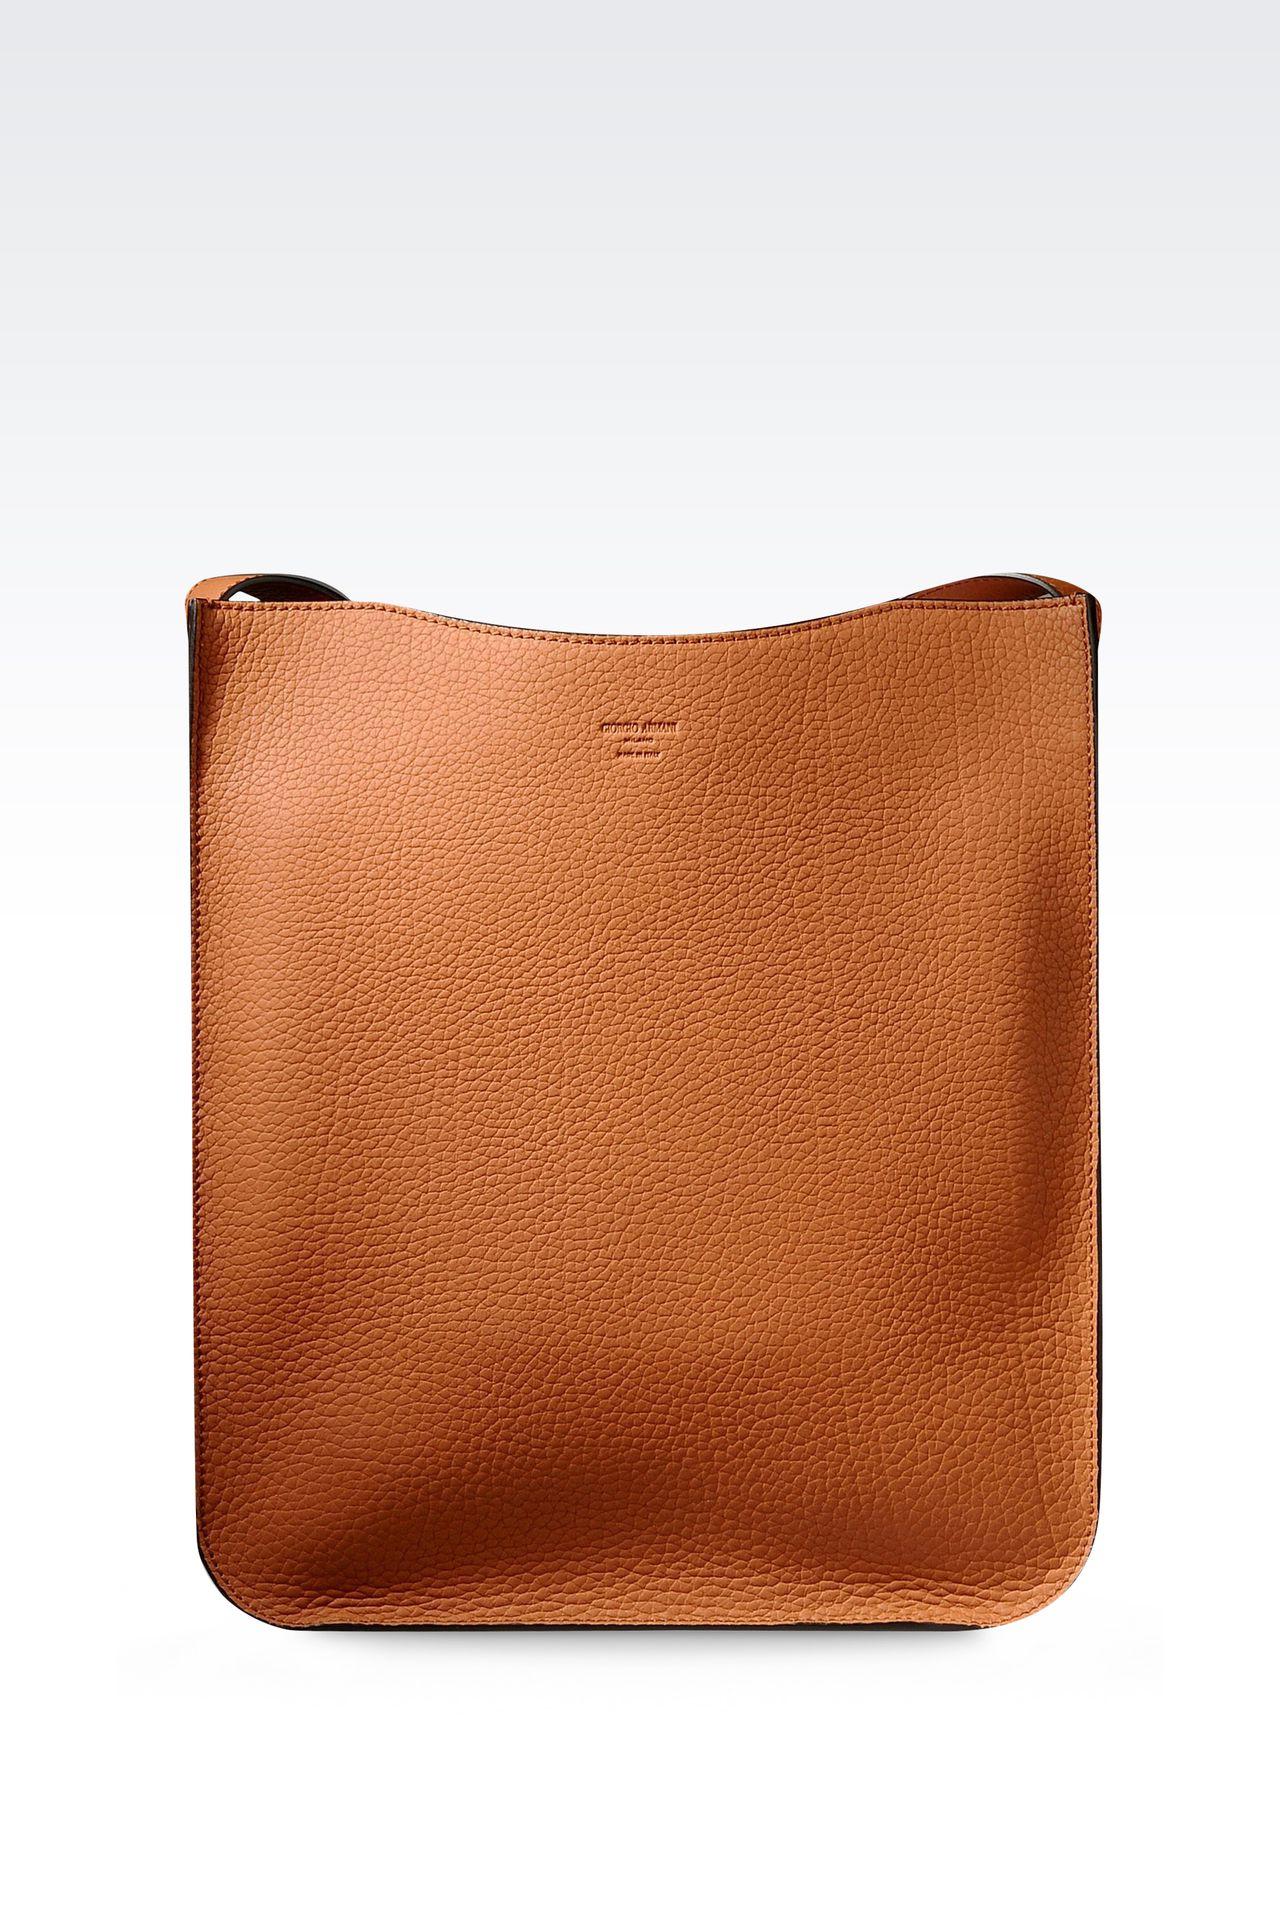 SHOULDER BAG IN CALFSKIN LEATHER: Hobo bags Men by Armani - 0